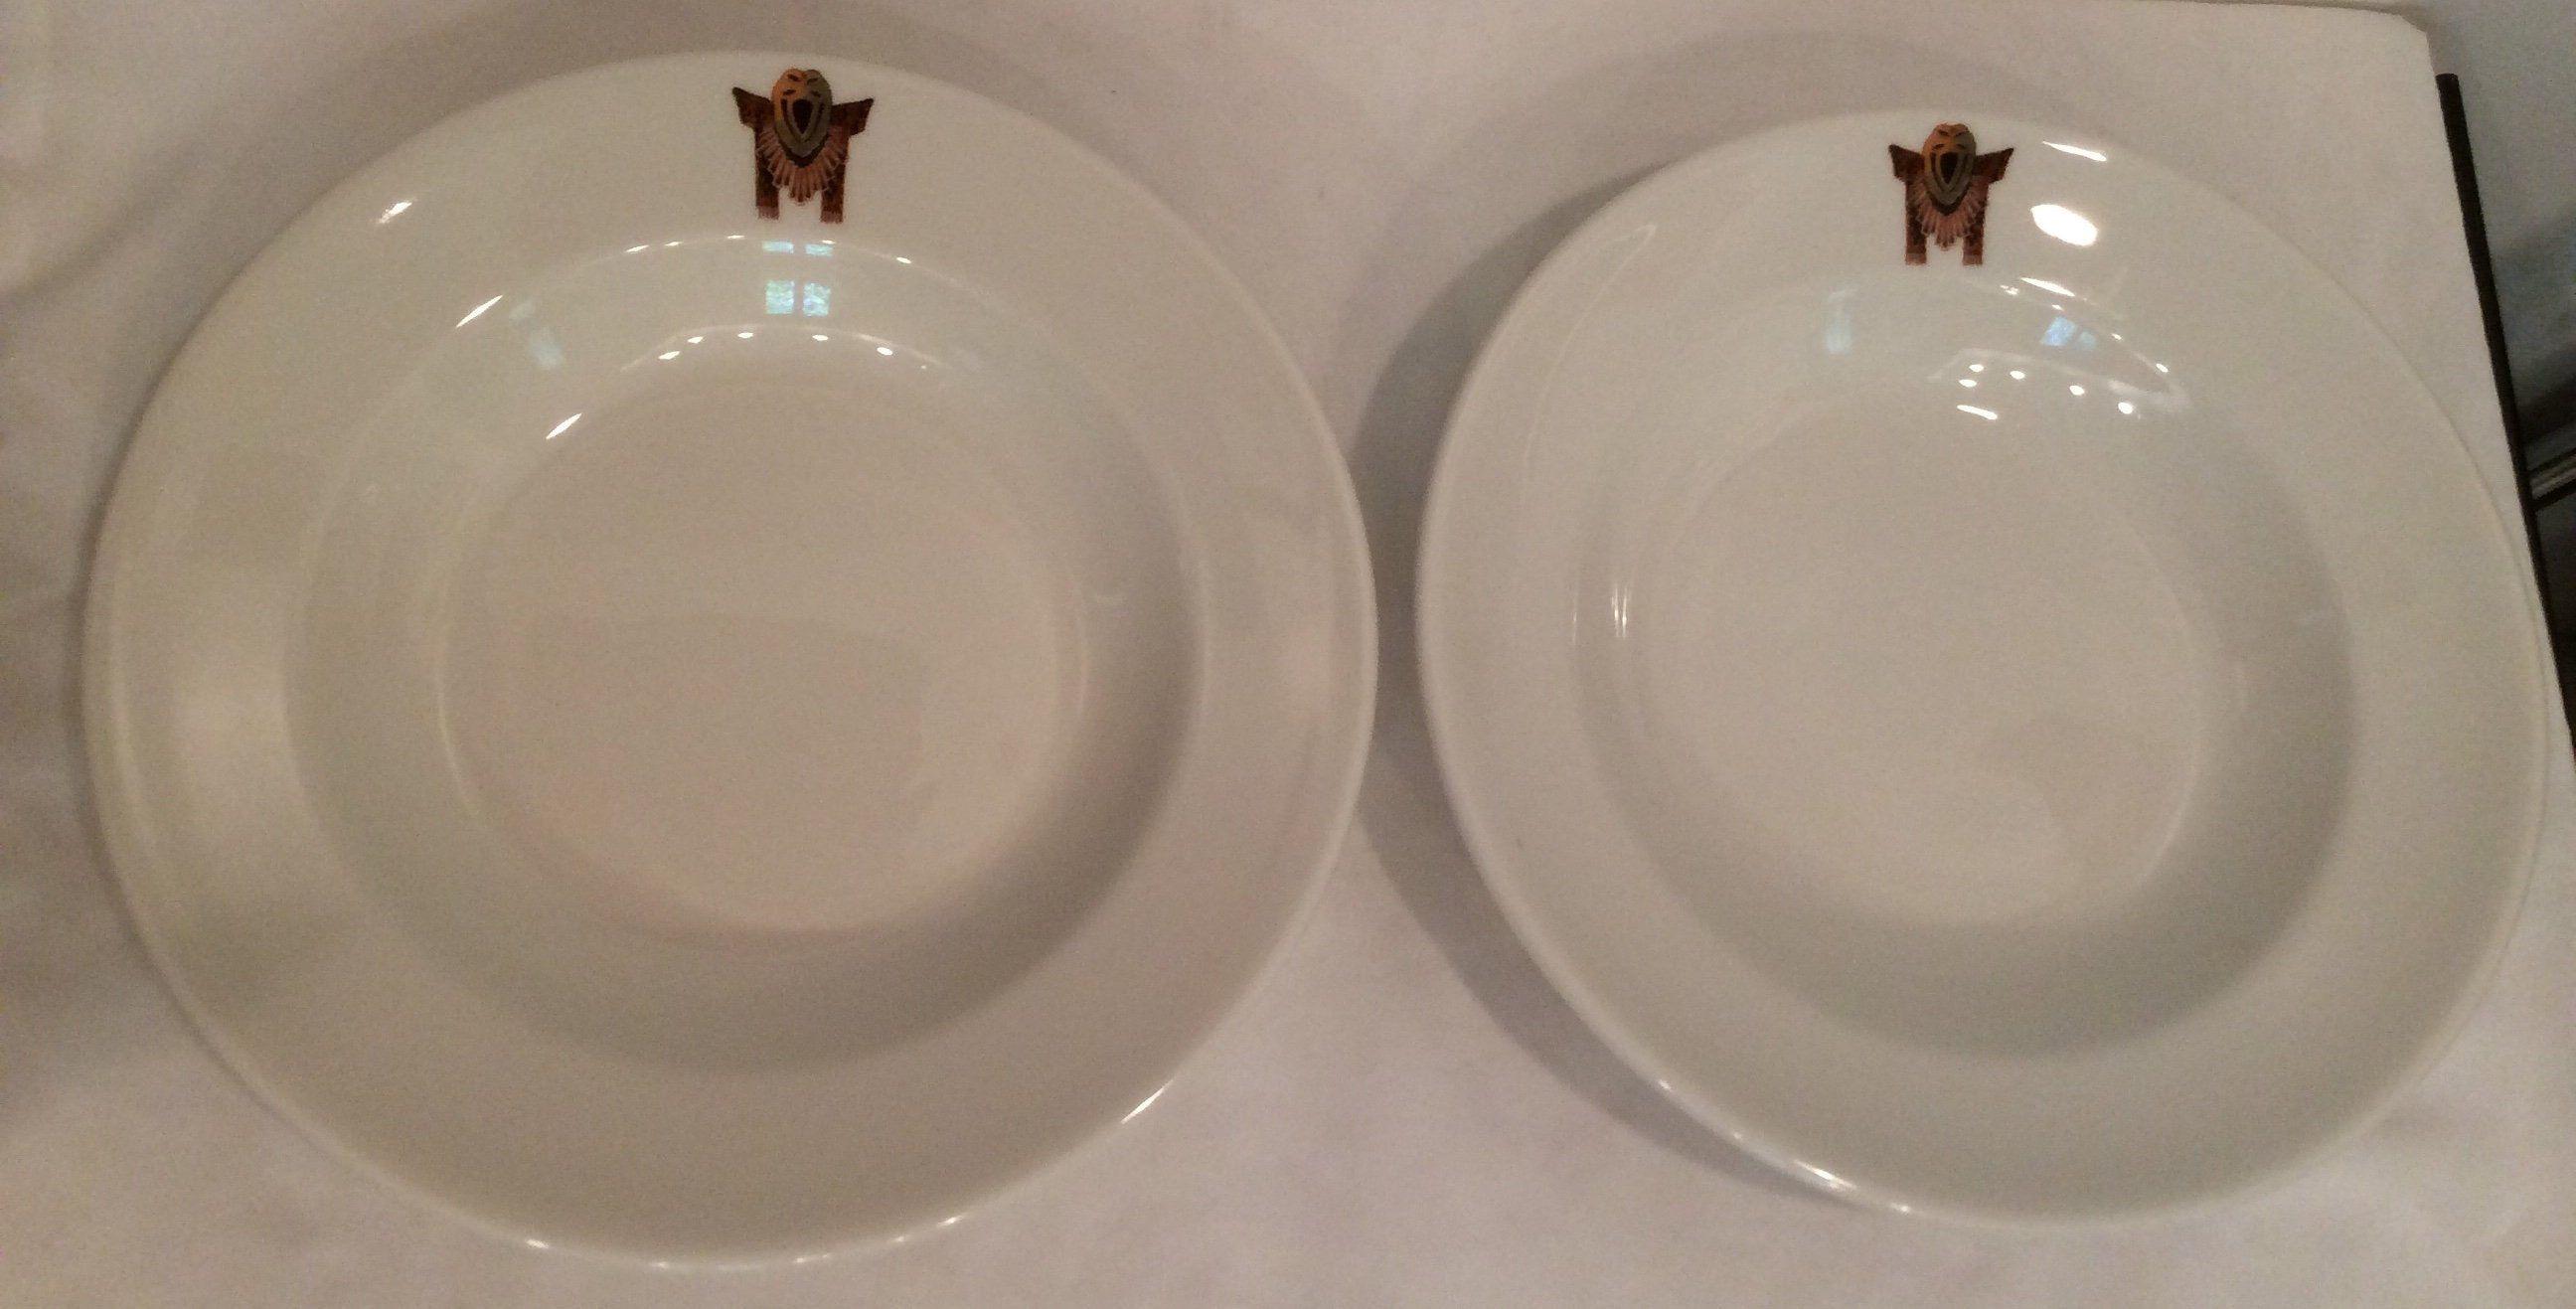 Items similar to Syracuse China O.P.C.O. Soup bowls Mohawk Indian Native American Indian memorabilia collectible dish ware housewarming gift wedding gift on Etsy